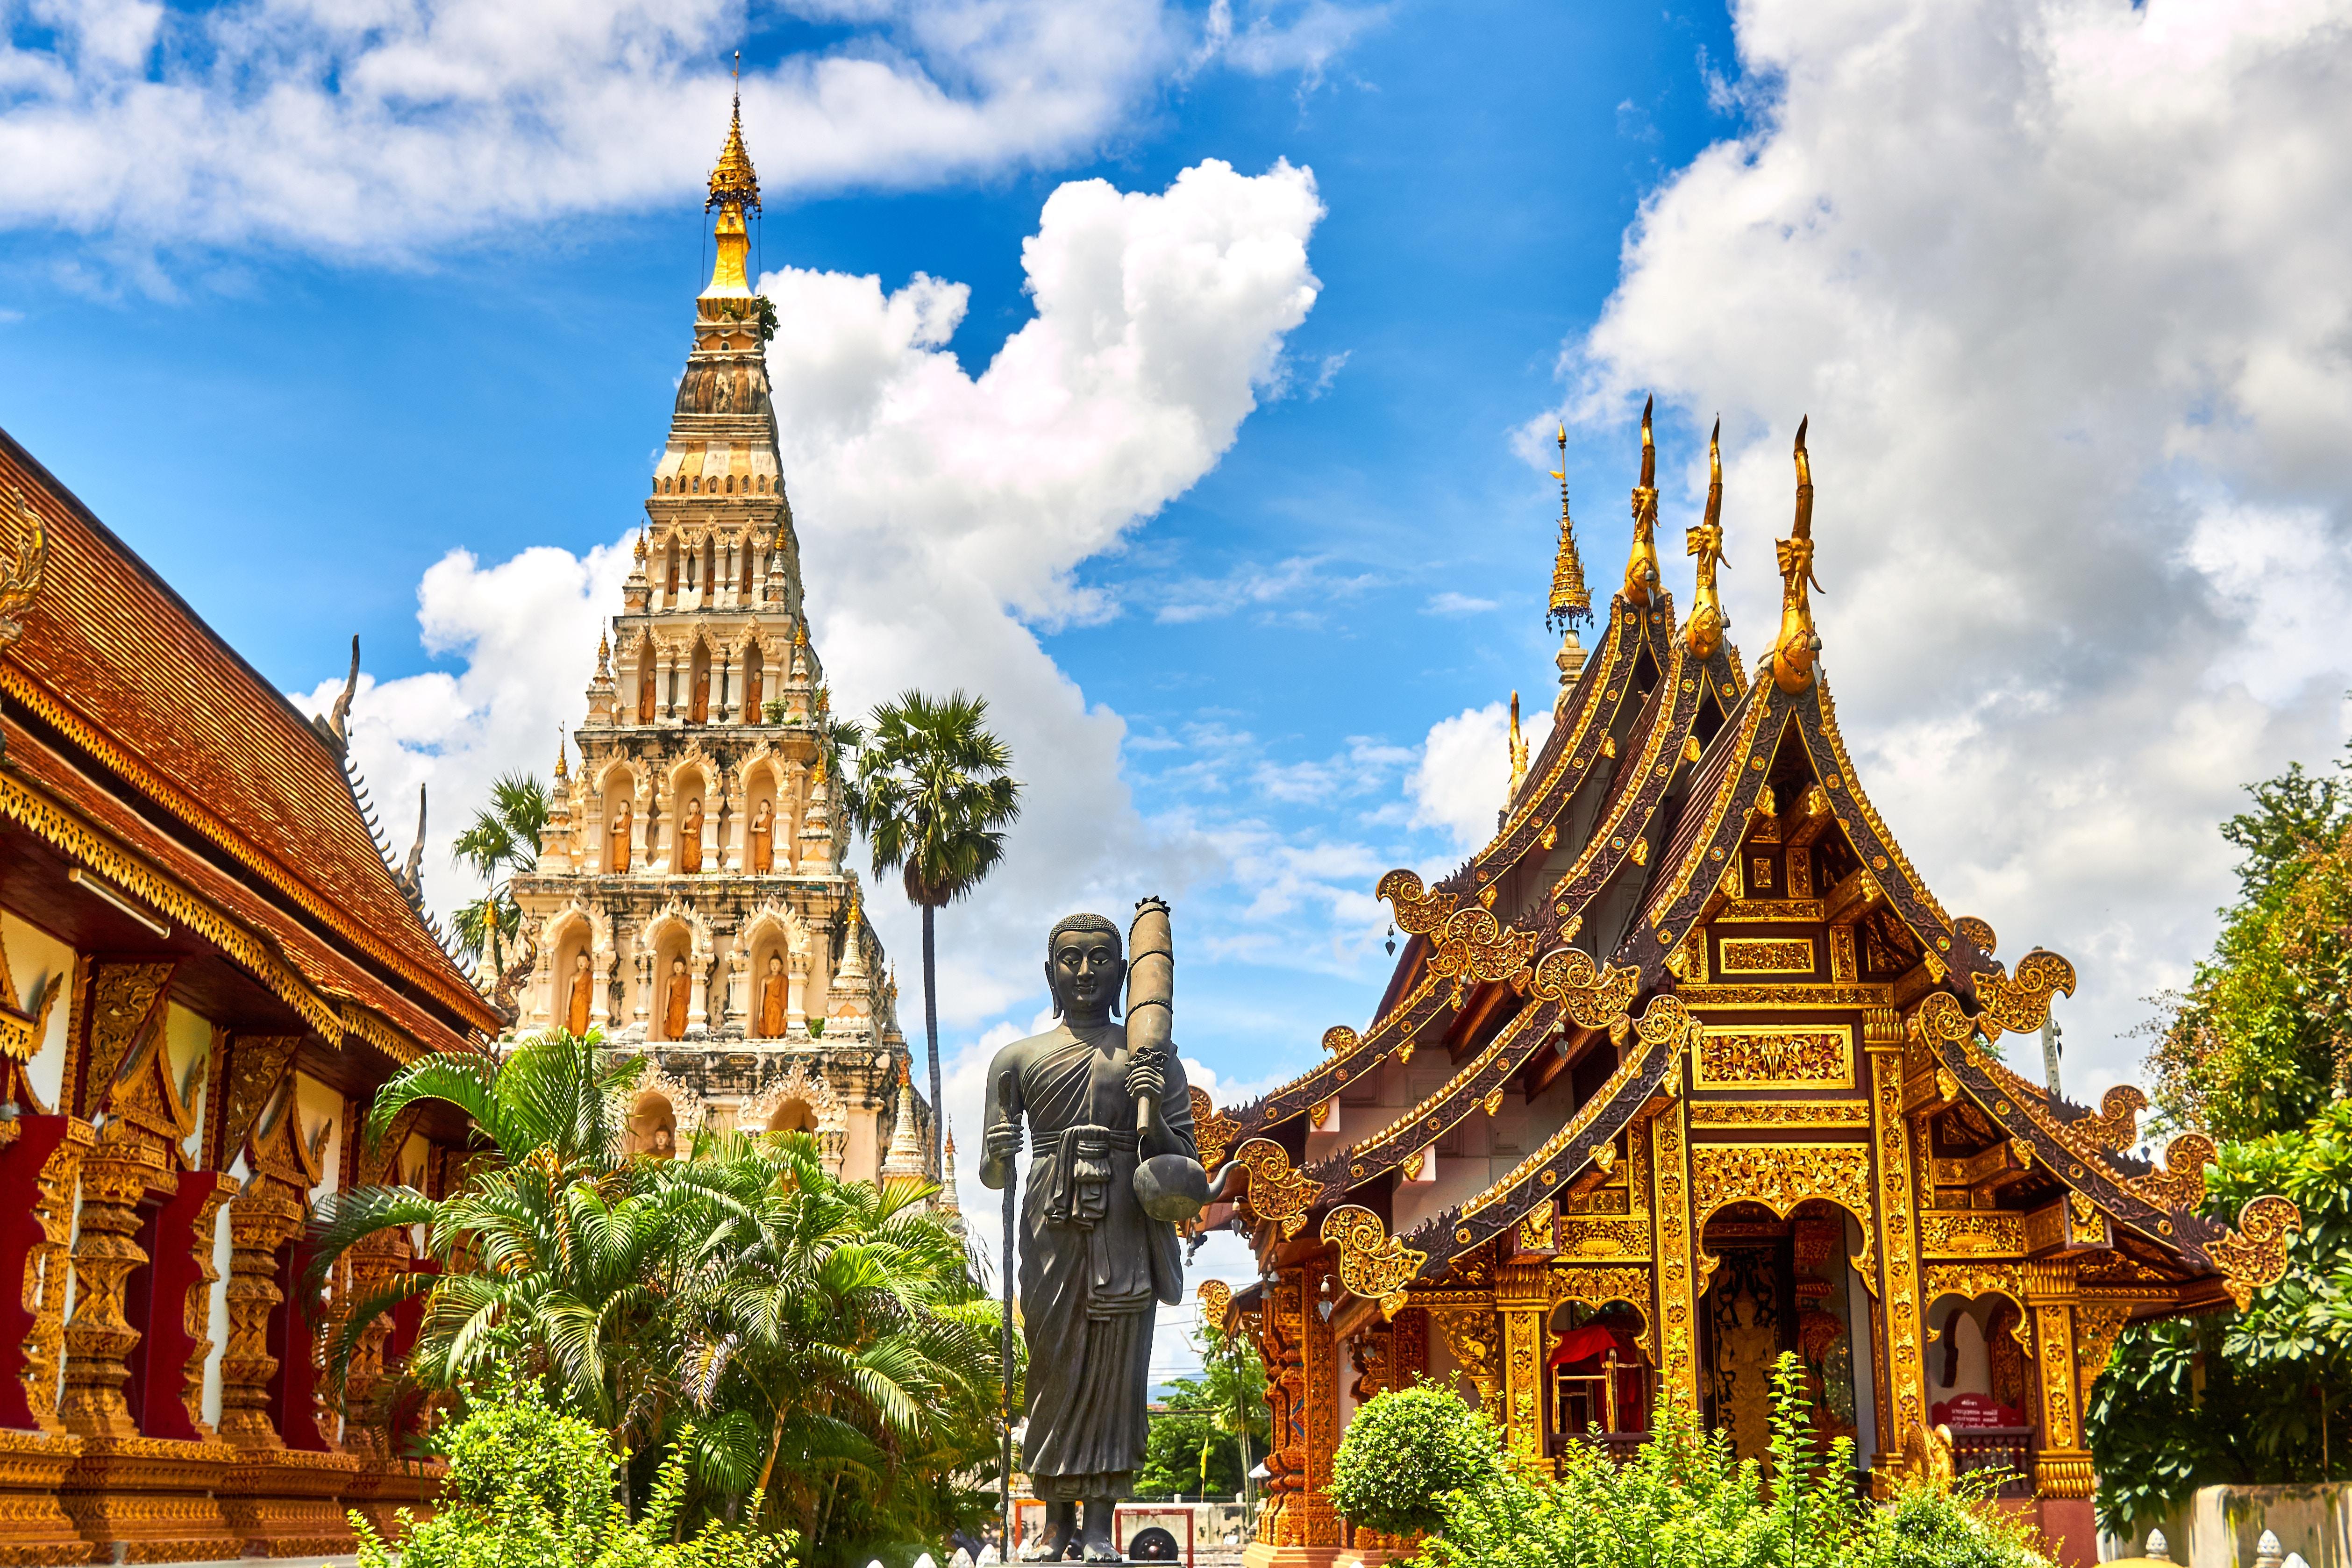 Viaggio di Nozze - Thailandia | Expotur Viaggi